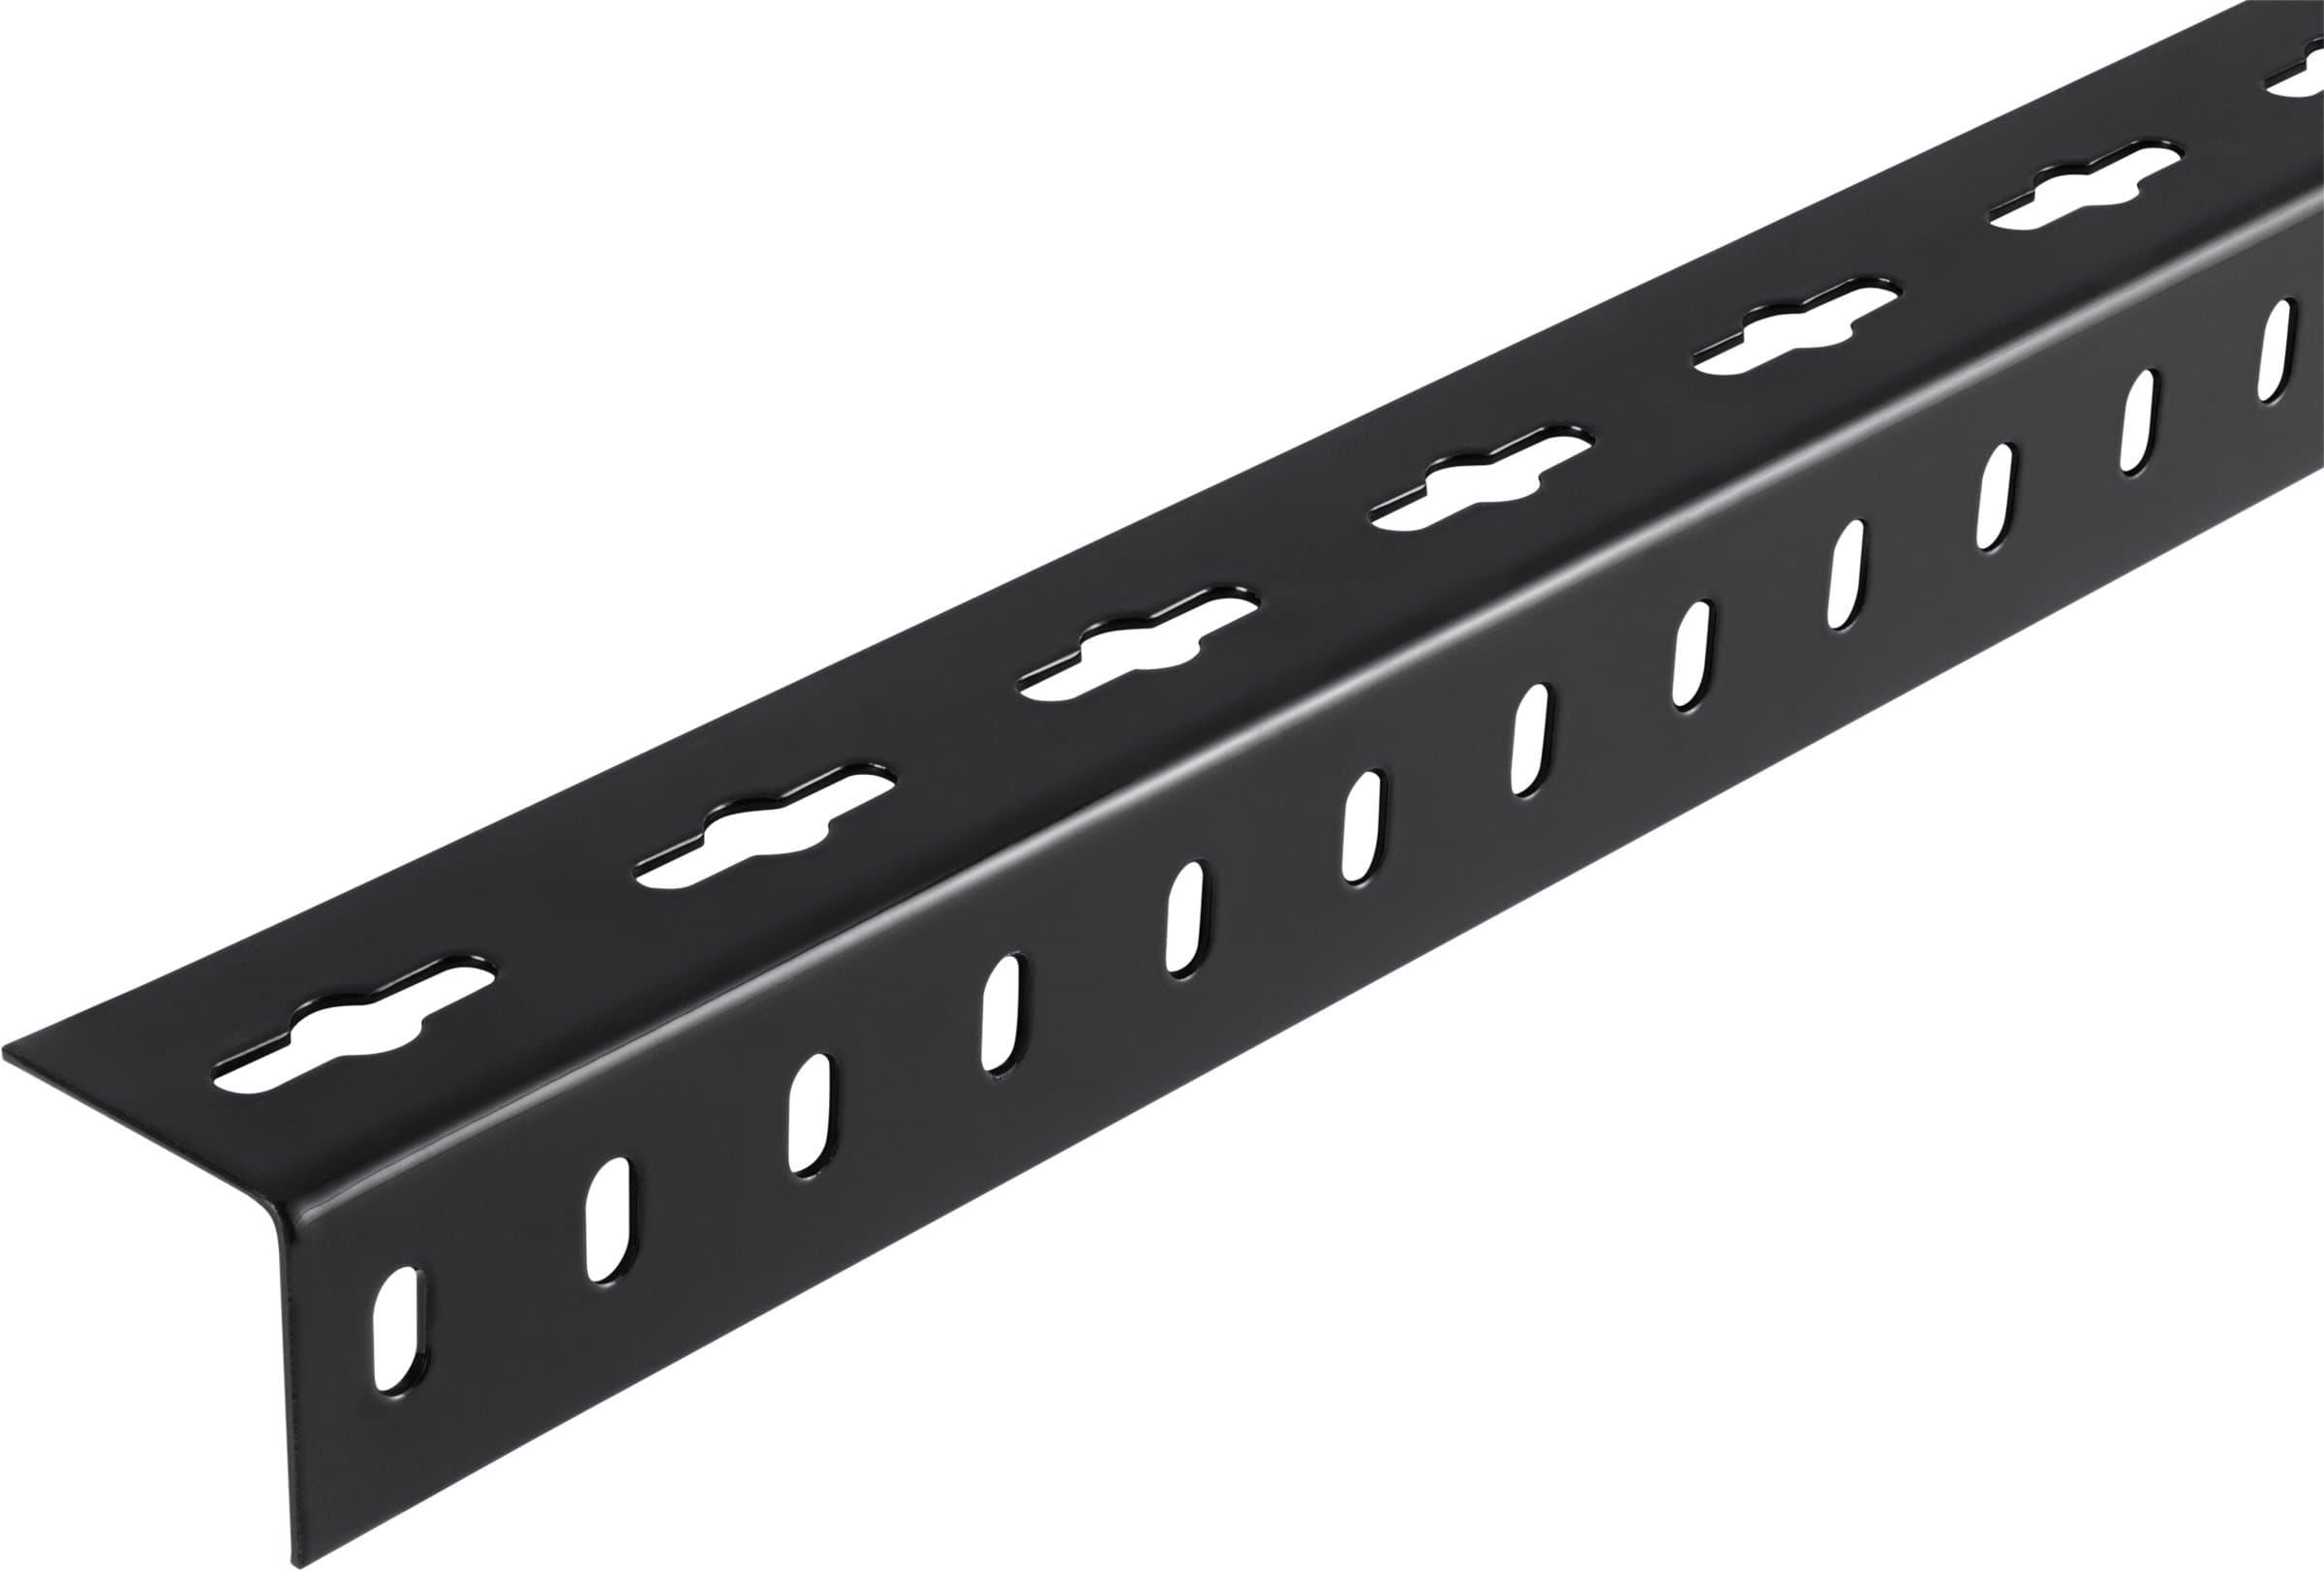 alfer Angolare isoscele 35.5 x 35.5 forato acciaio nero 2 m